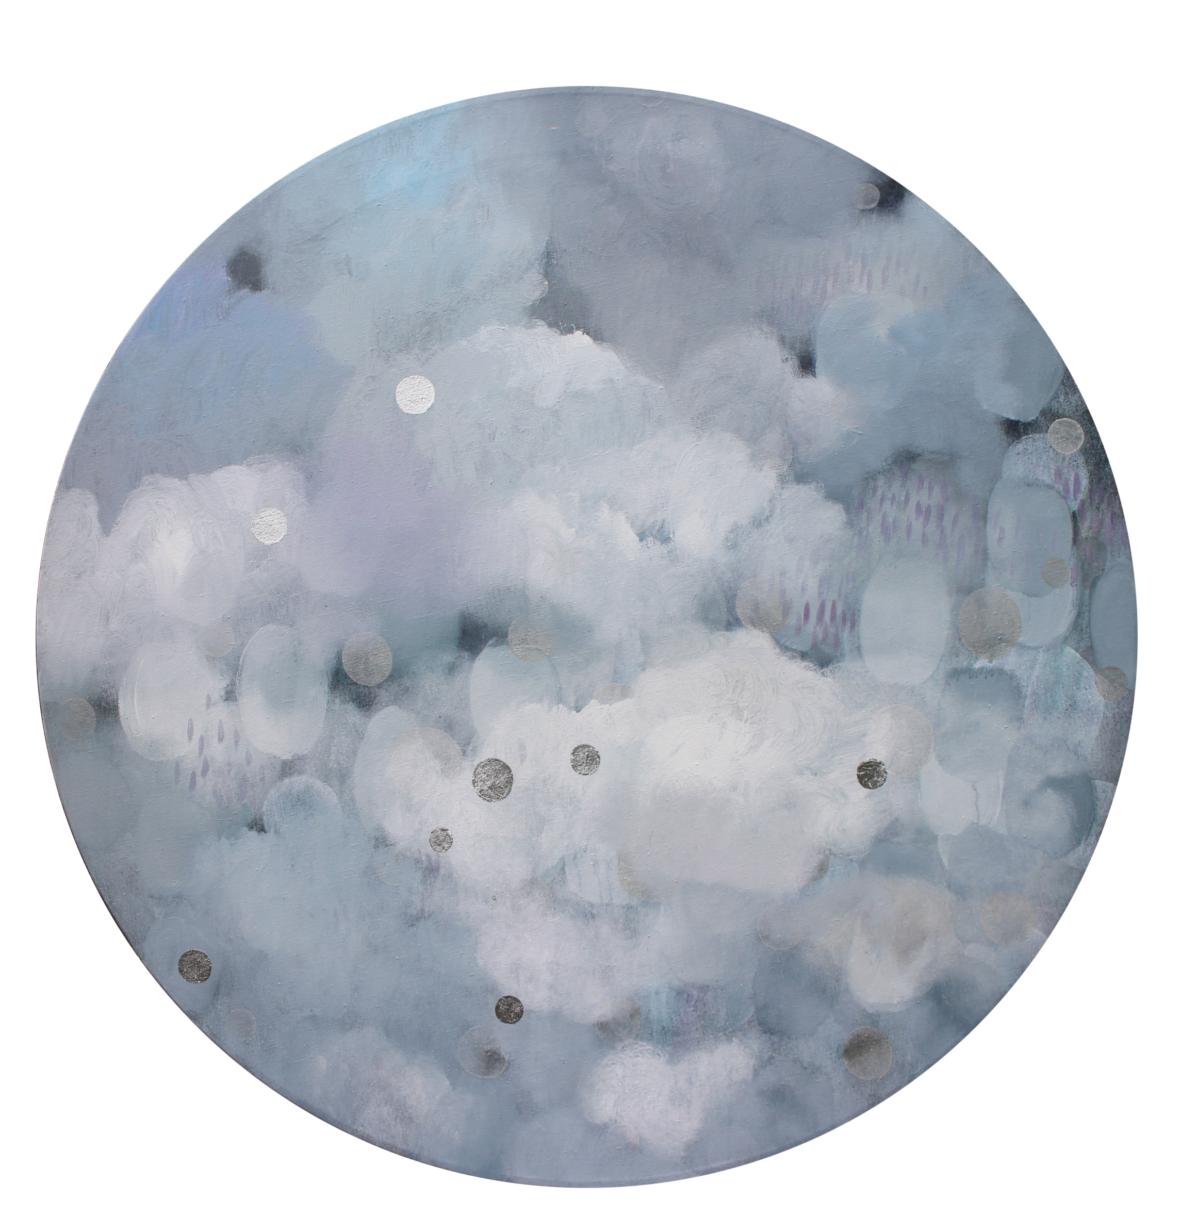 Sarjasta Kaunismaailma 61., akryyli ja lyöntimetalli, 110 cm, 2016